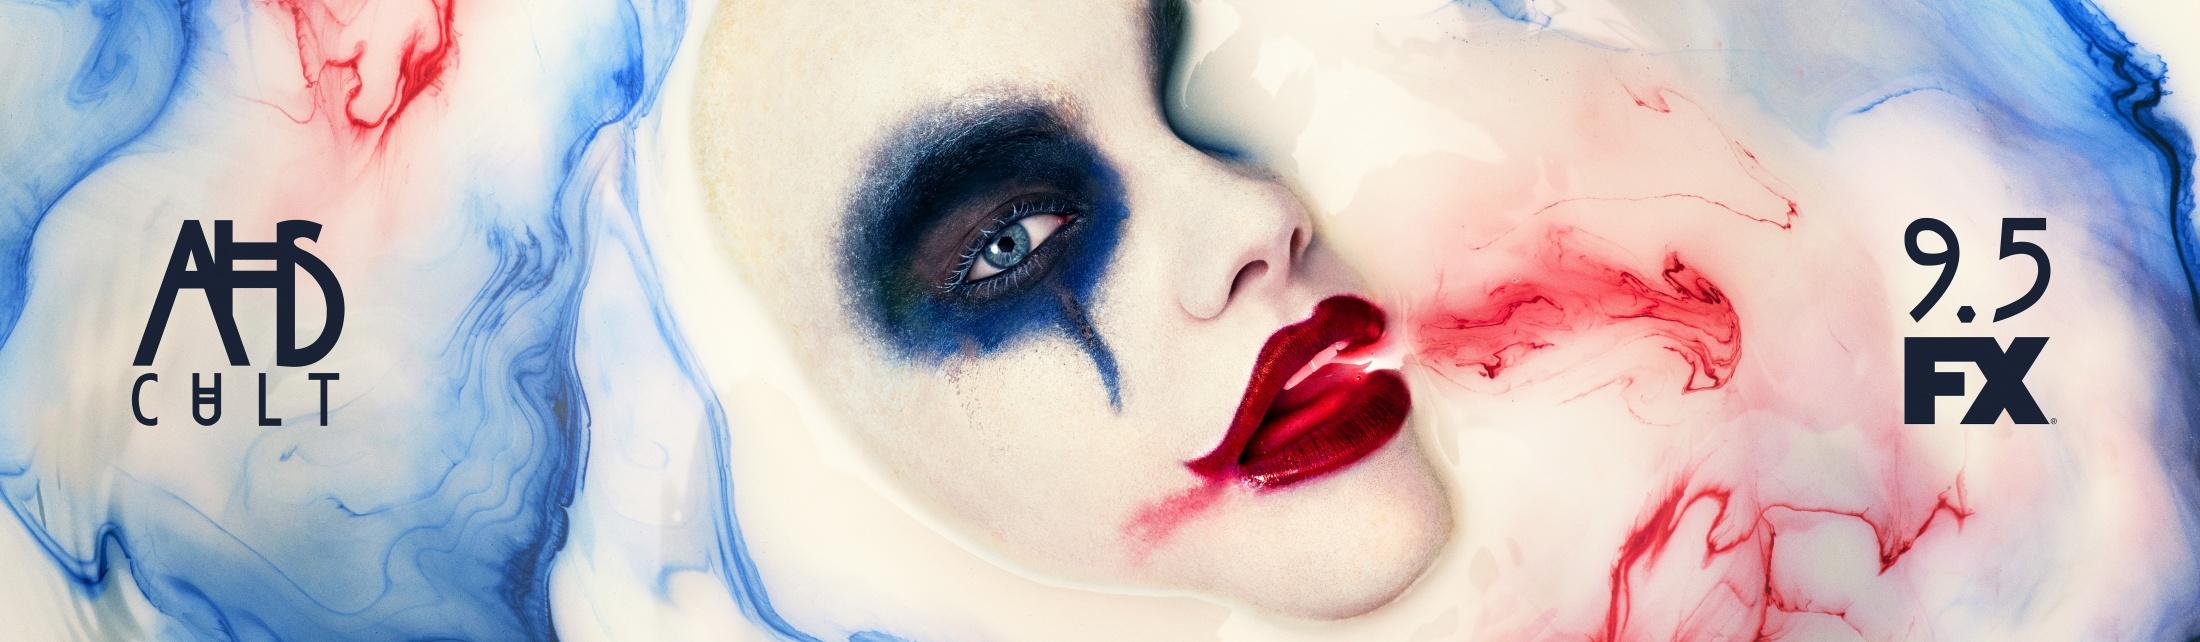 Thumbnail for American Horror Story: Cult Milk Bath Billboard